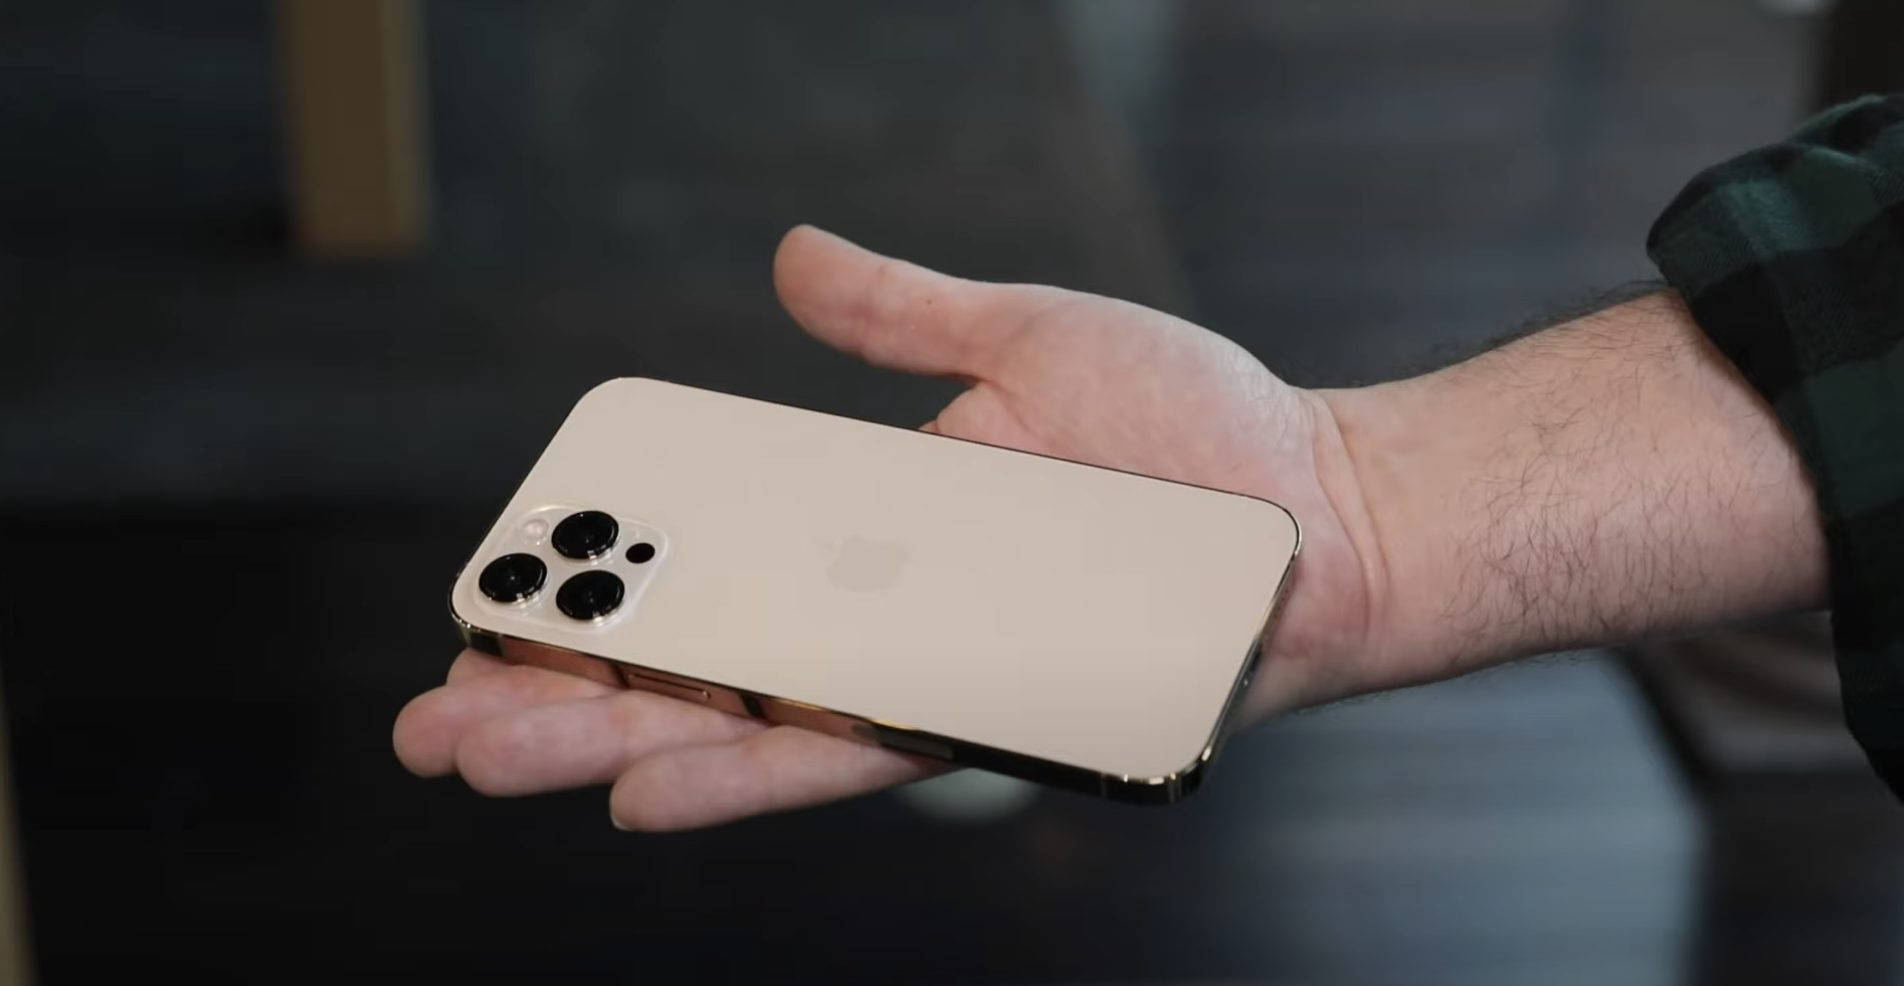 iphone12-pro-max-cnet